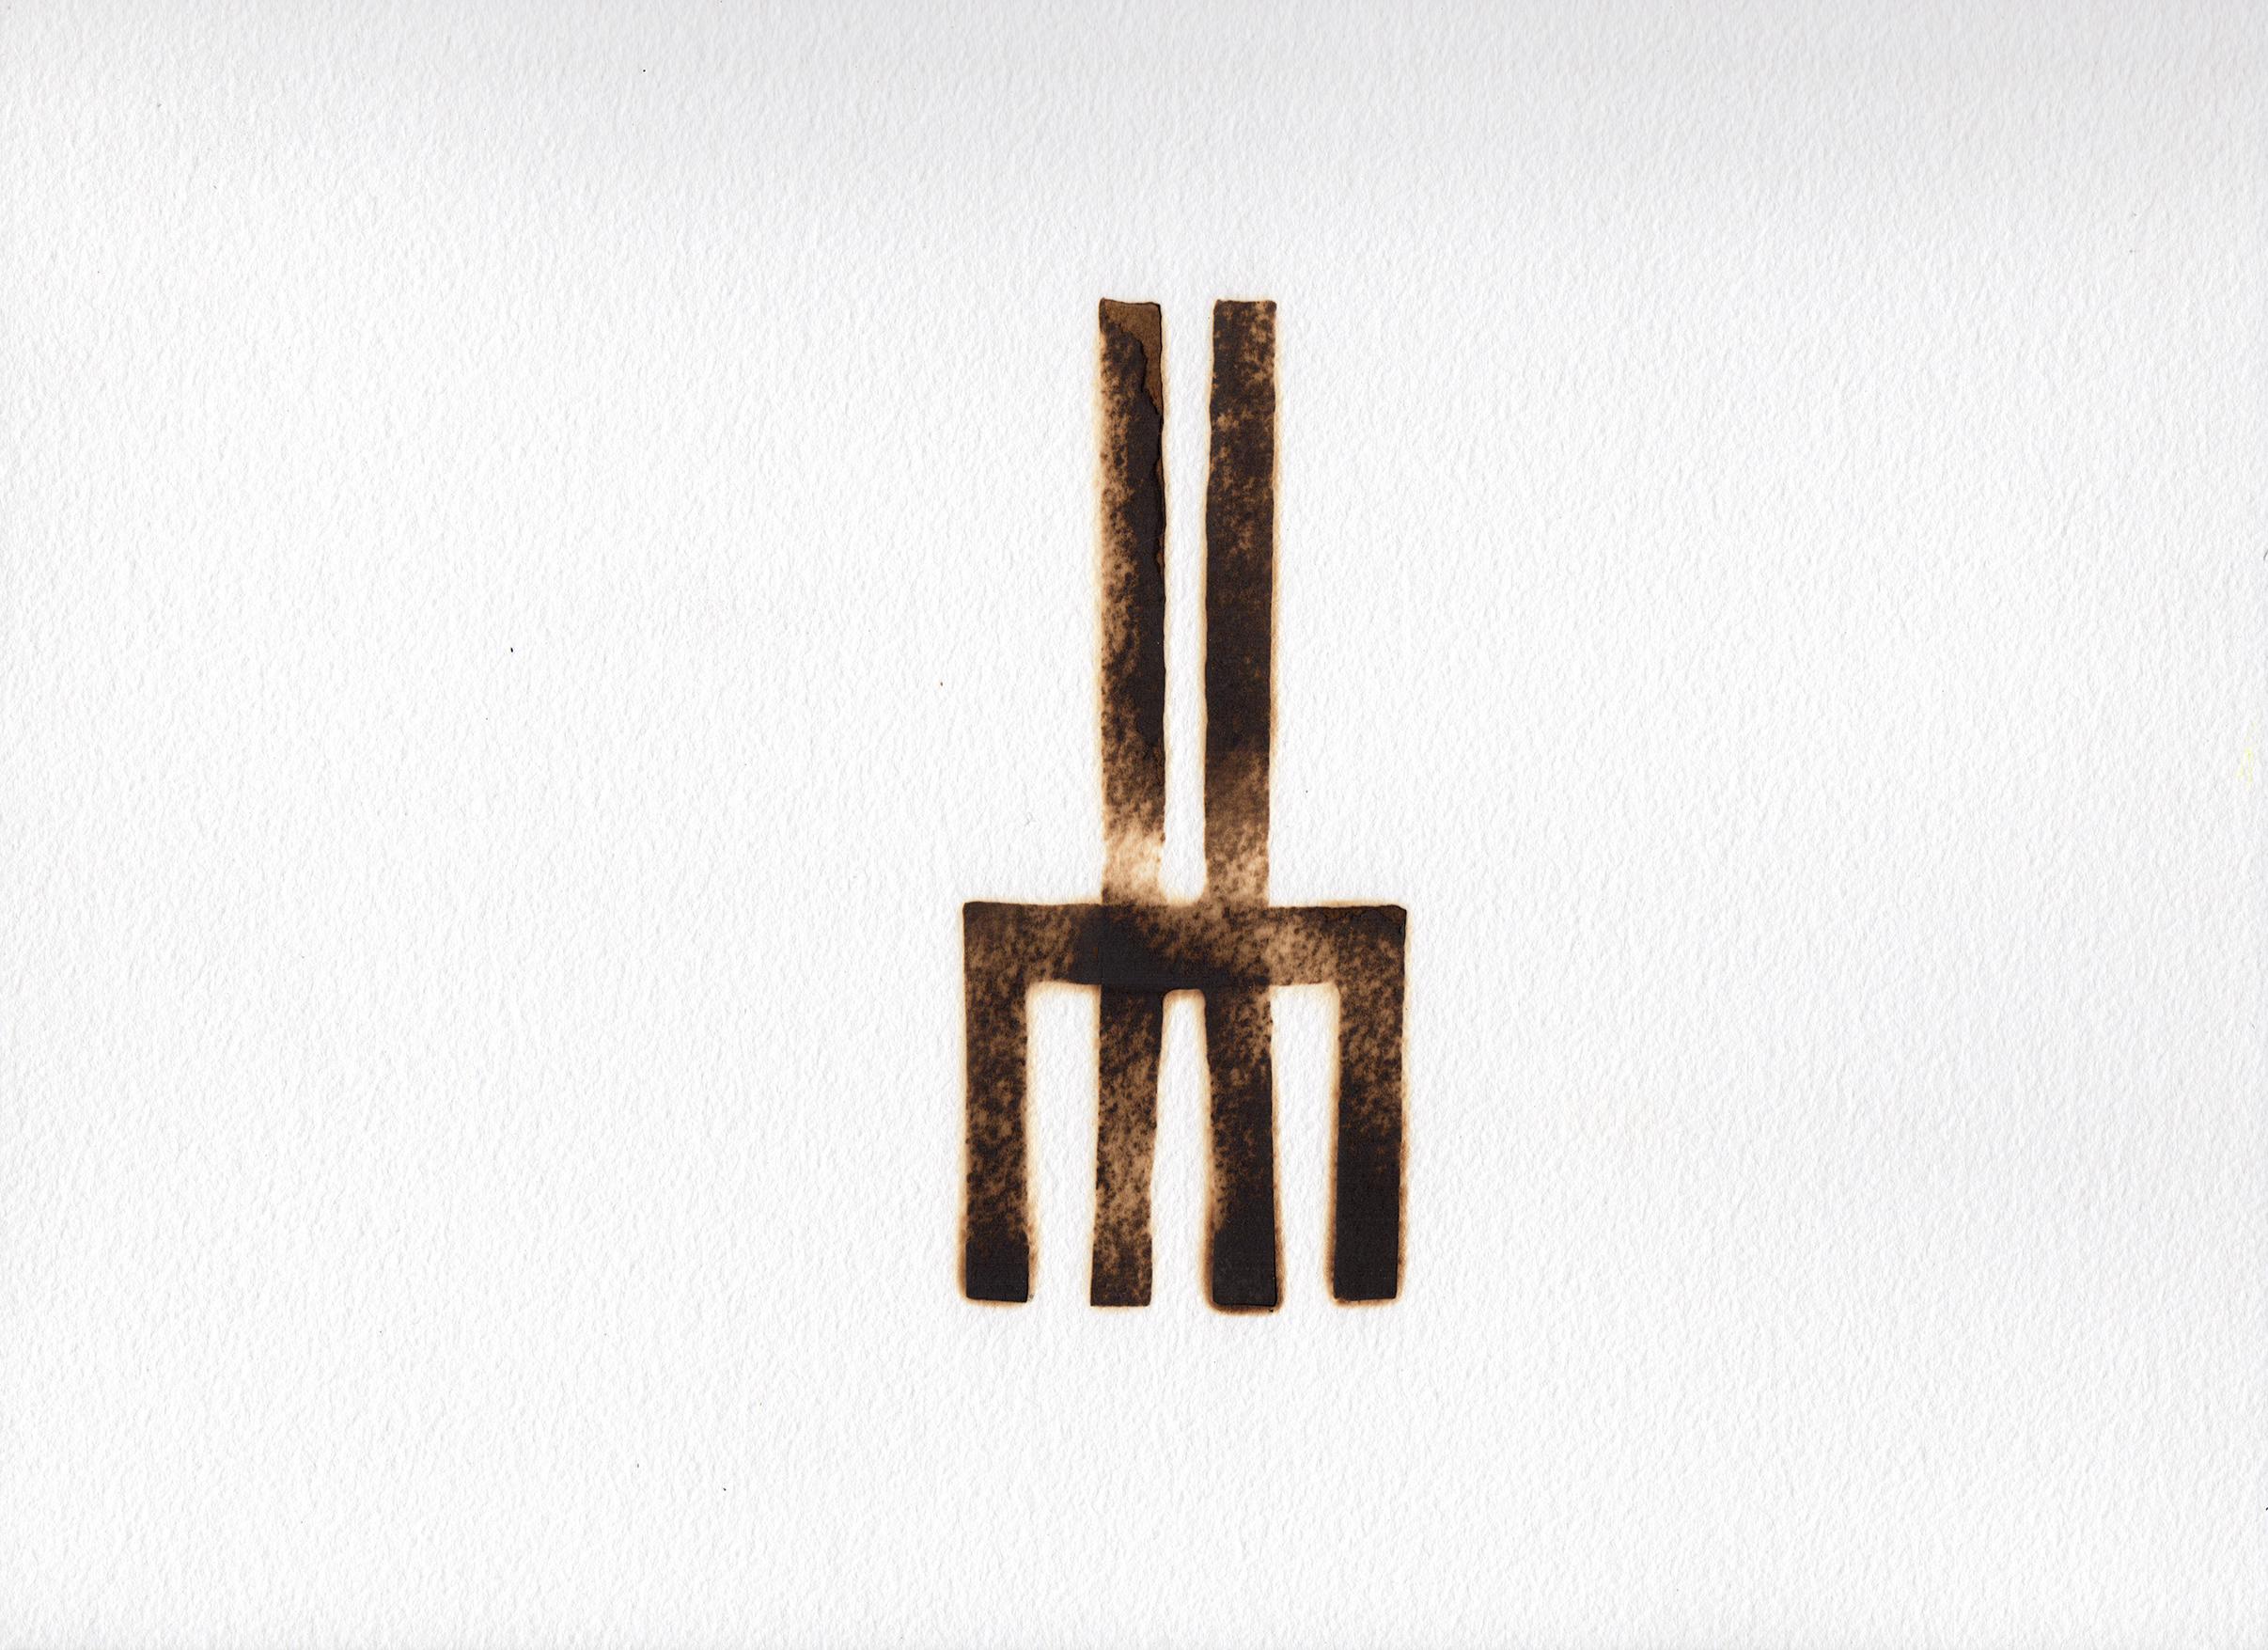 Rearranging the Furniture-detail I 2015 I   pyrograph I 16 x 11.75